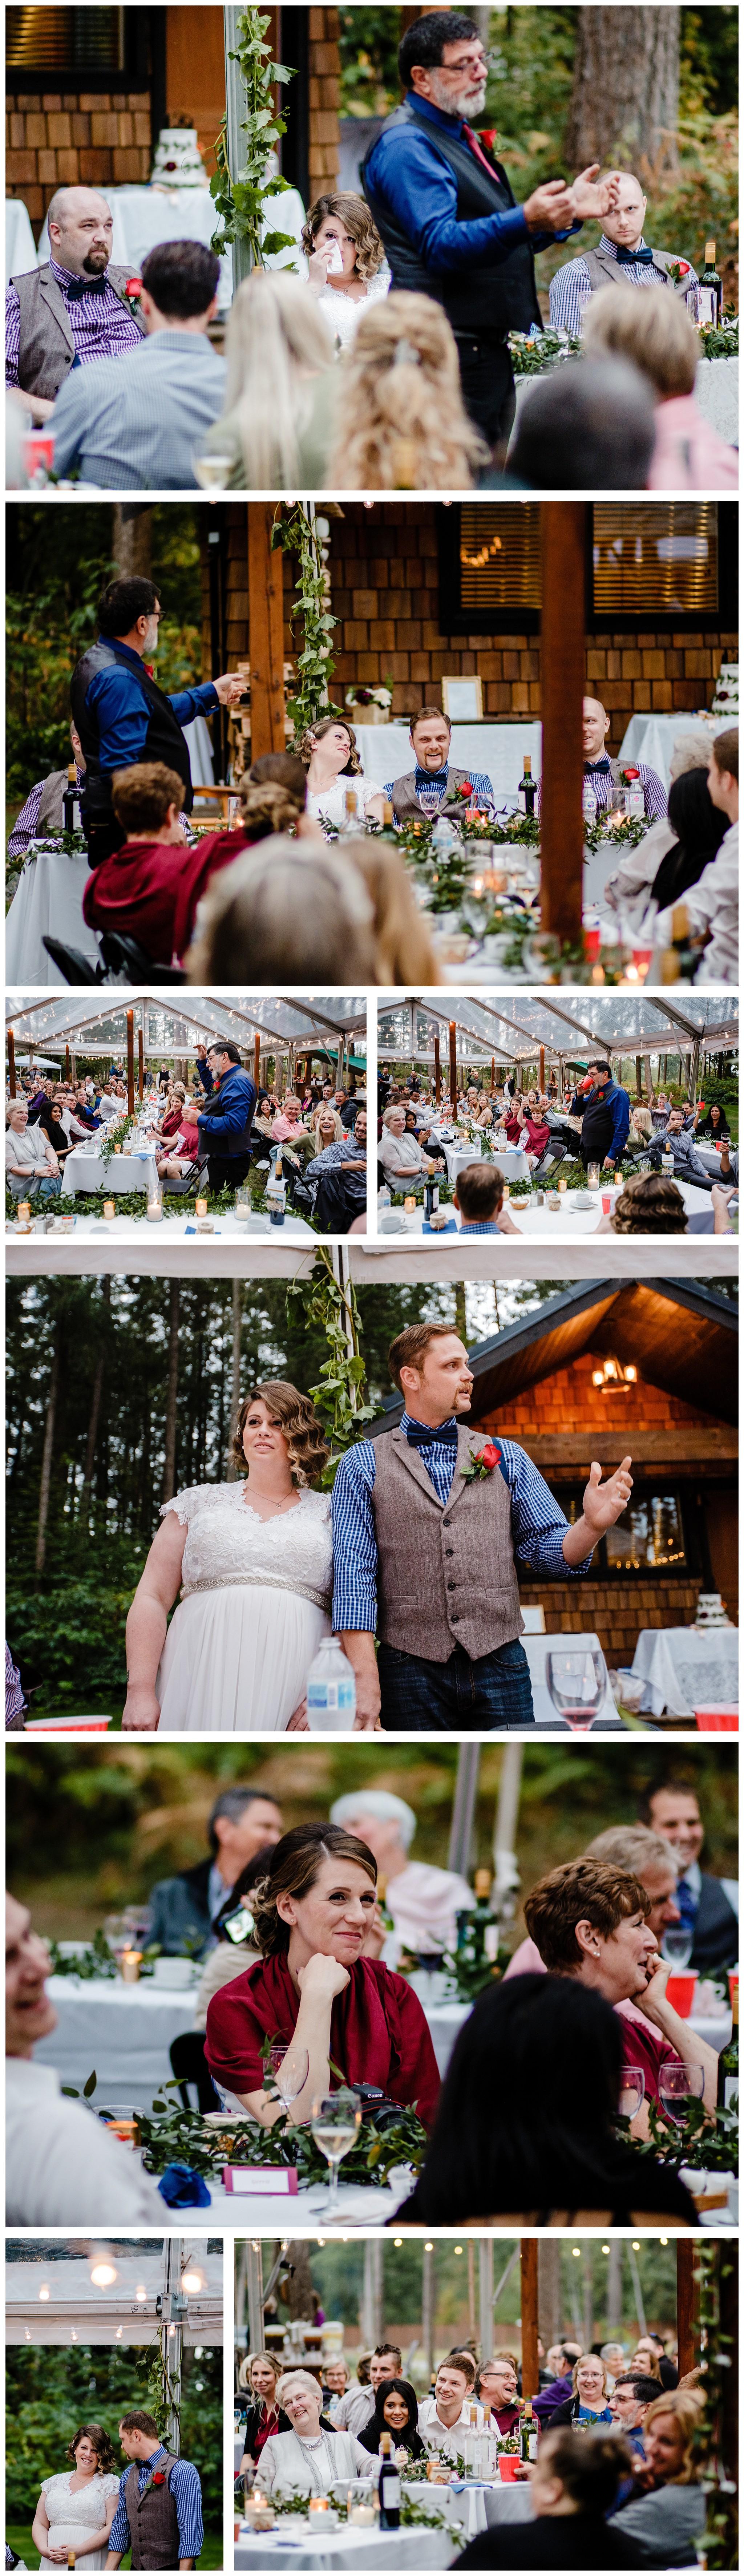 Aldergrove Park Fall Backyard Wedding Photographer Pregnant Bride Tent Outdoor BC Canada Best Wedding Photographer_0047.jpg